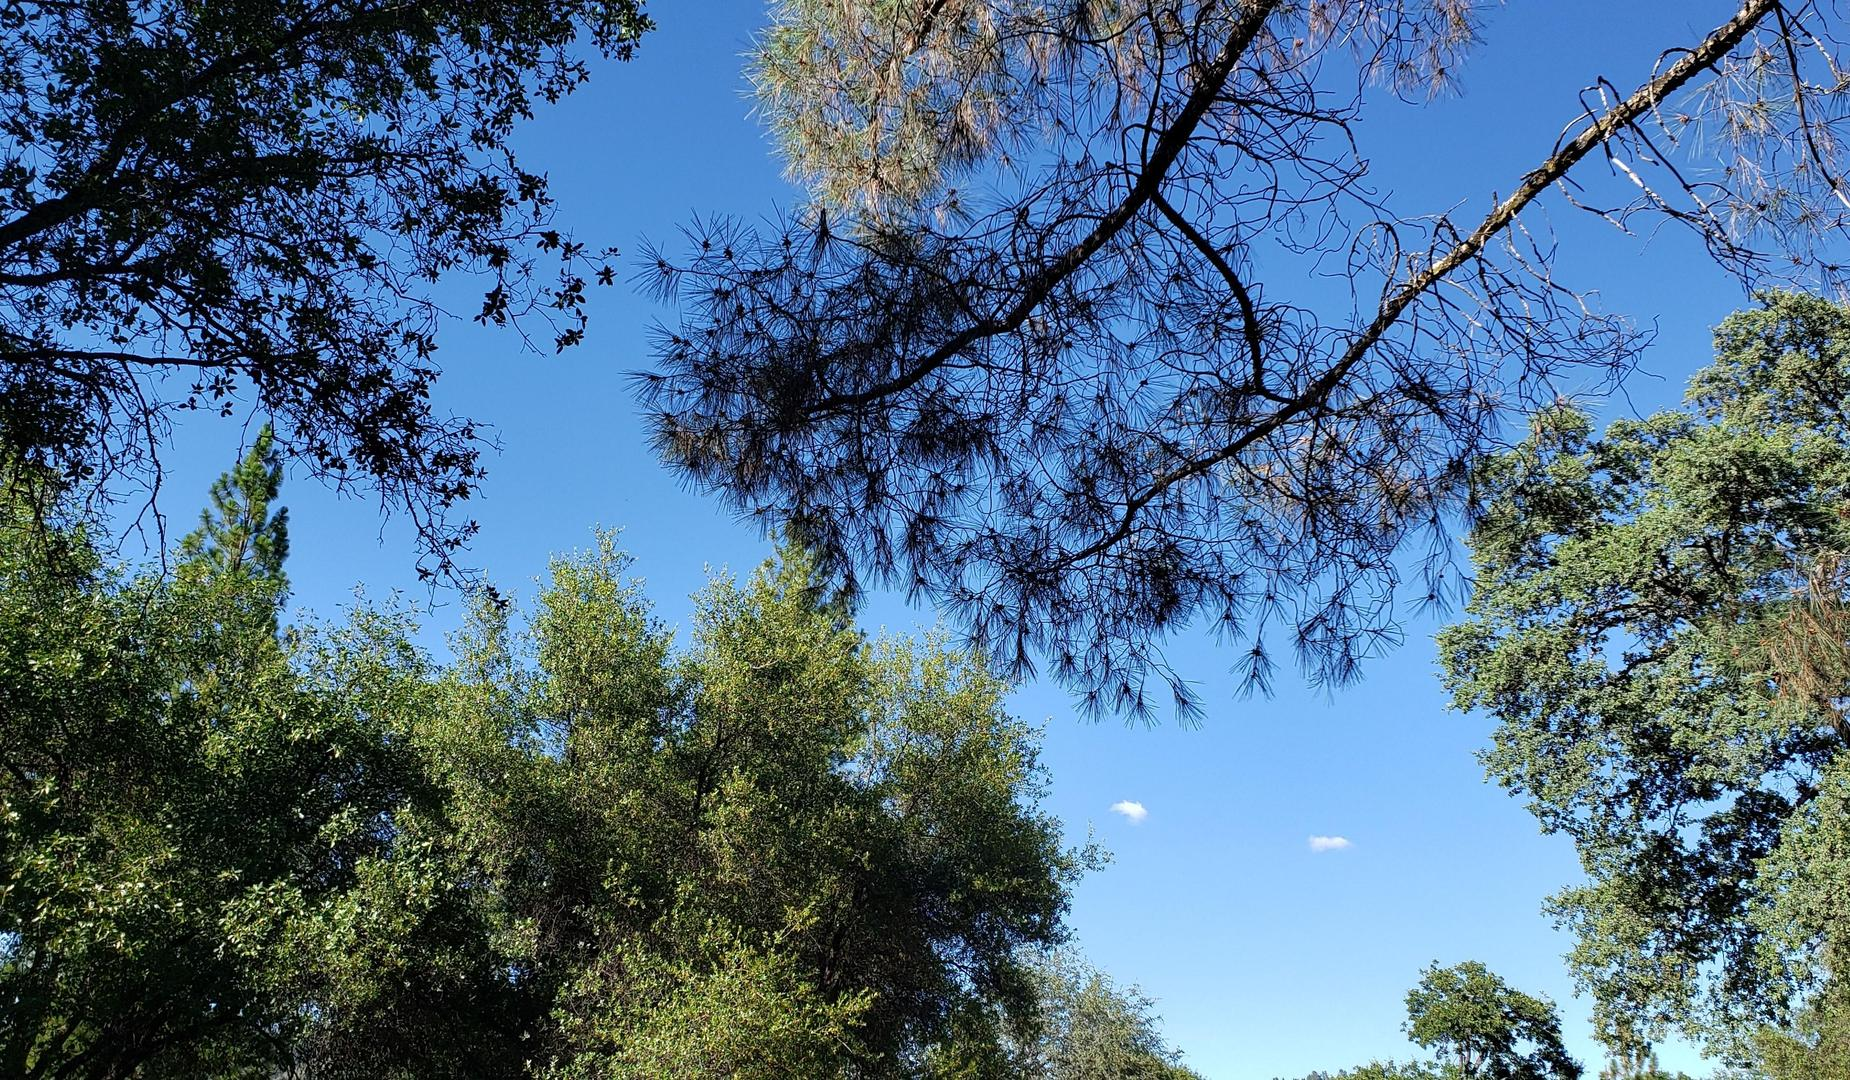 Murphys sky through the trees